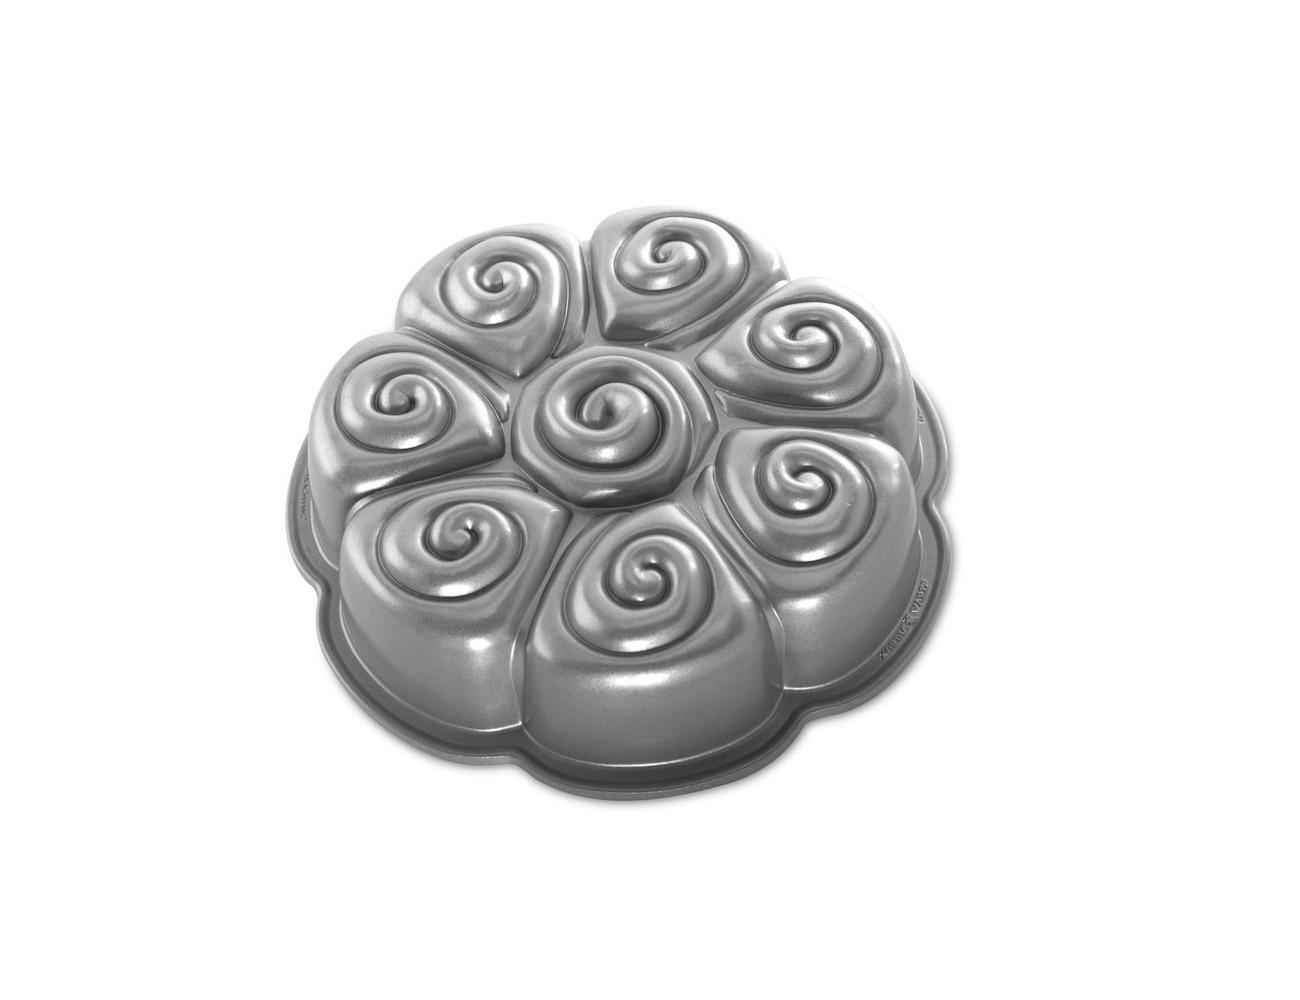 cinnamon-bun-pan-by-nordic-ware-04